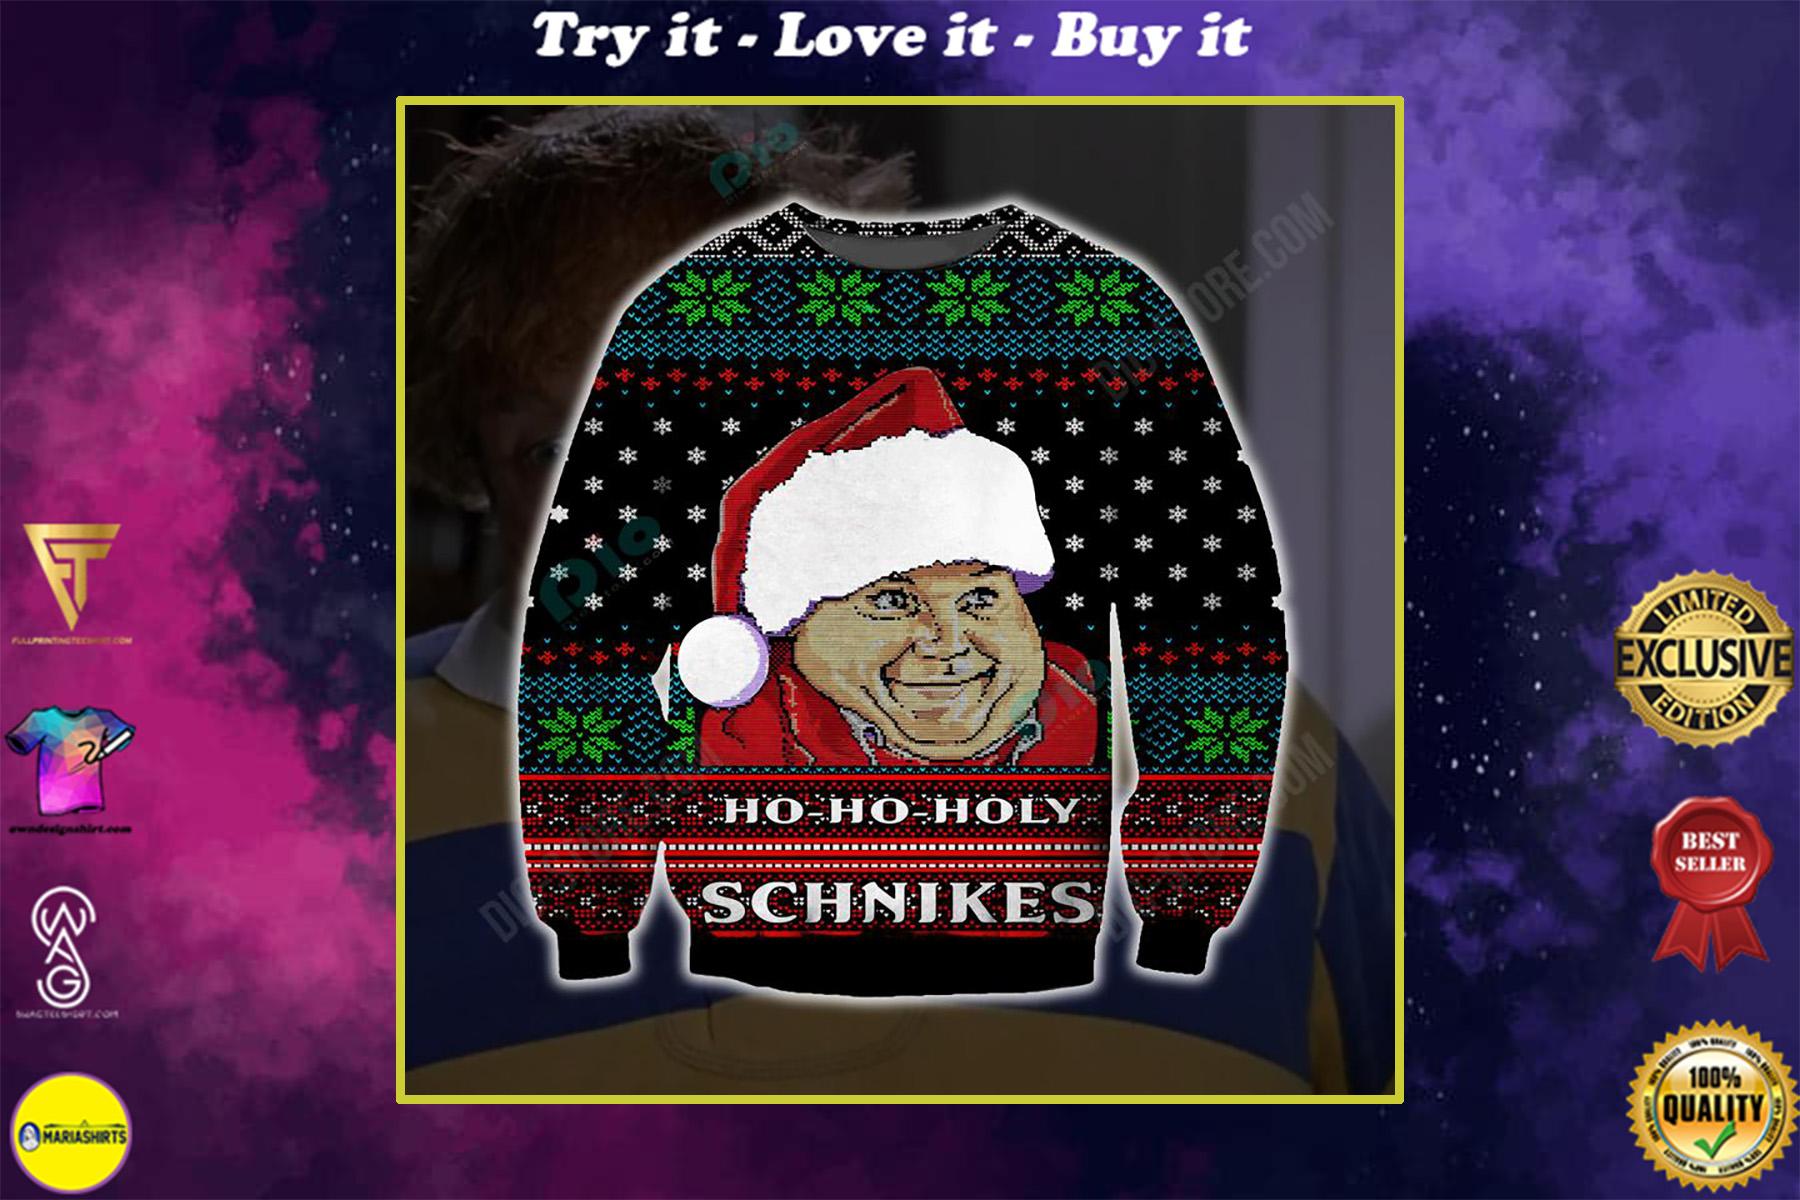 ho-ho-holy schnikes santa all over printed ugly christmas sweater